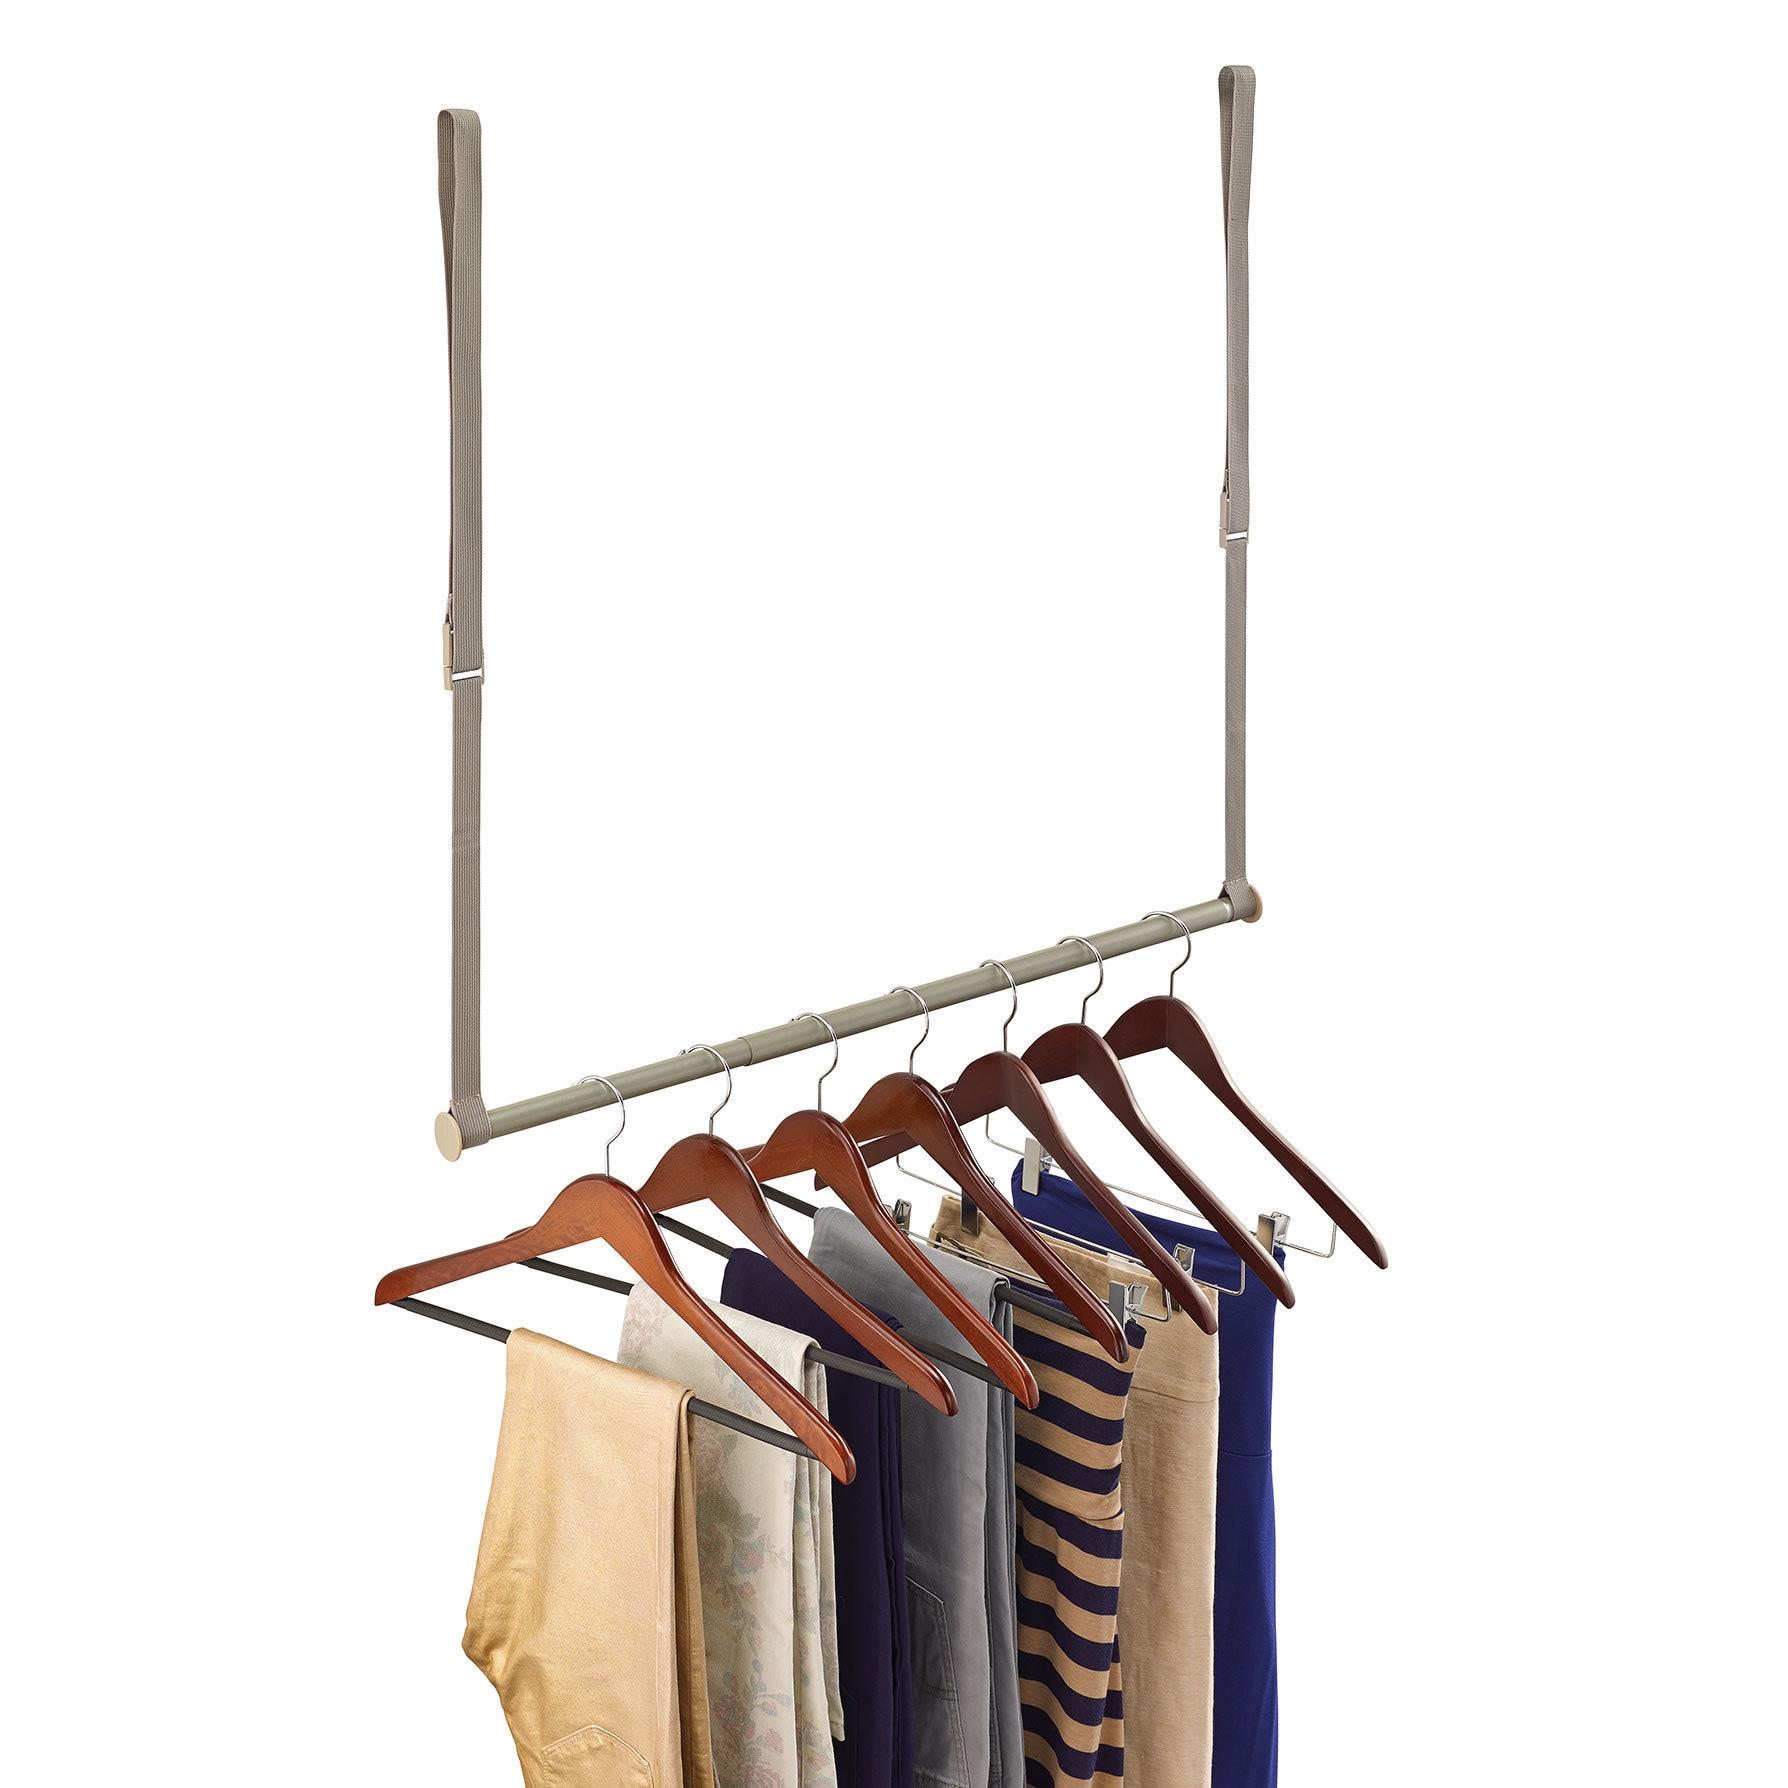 Shop Closetmaid Nickel Double Hang Closet Rod Overstock 11591341